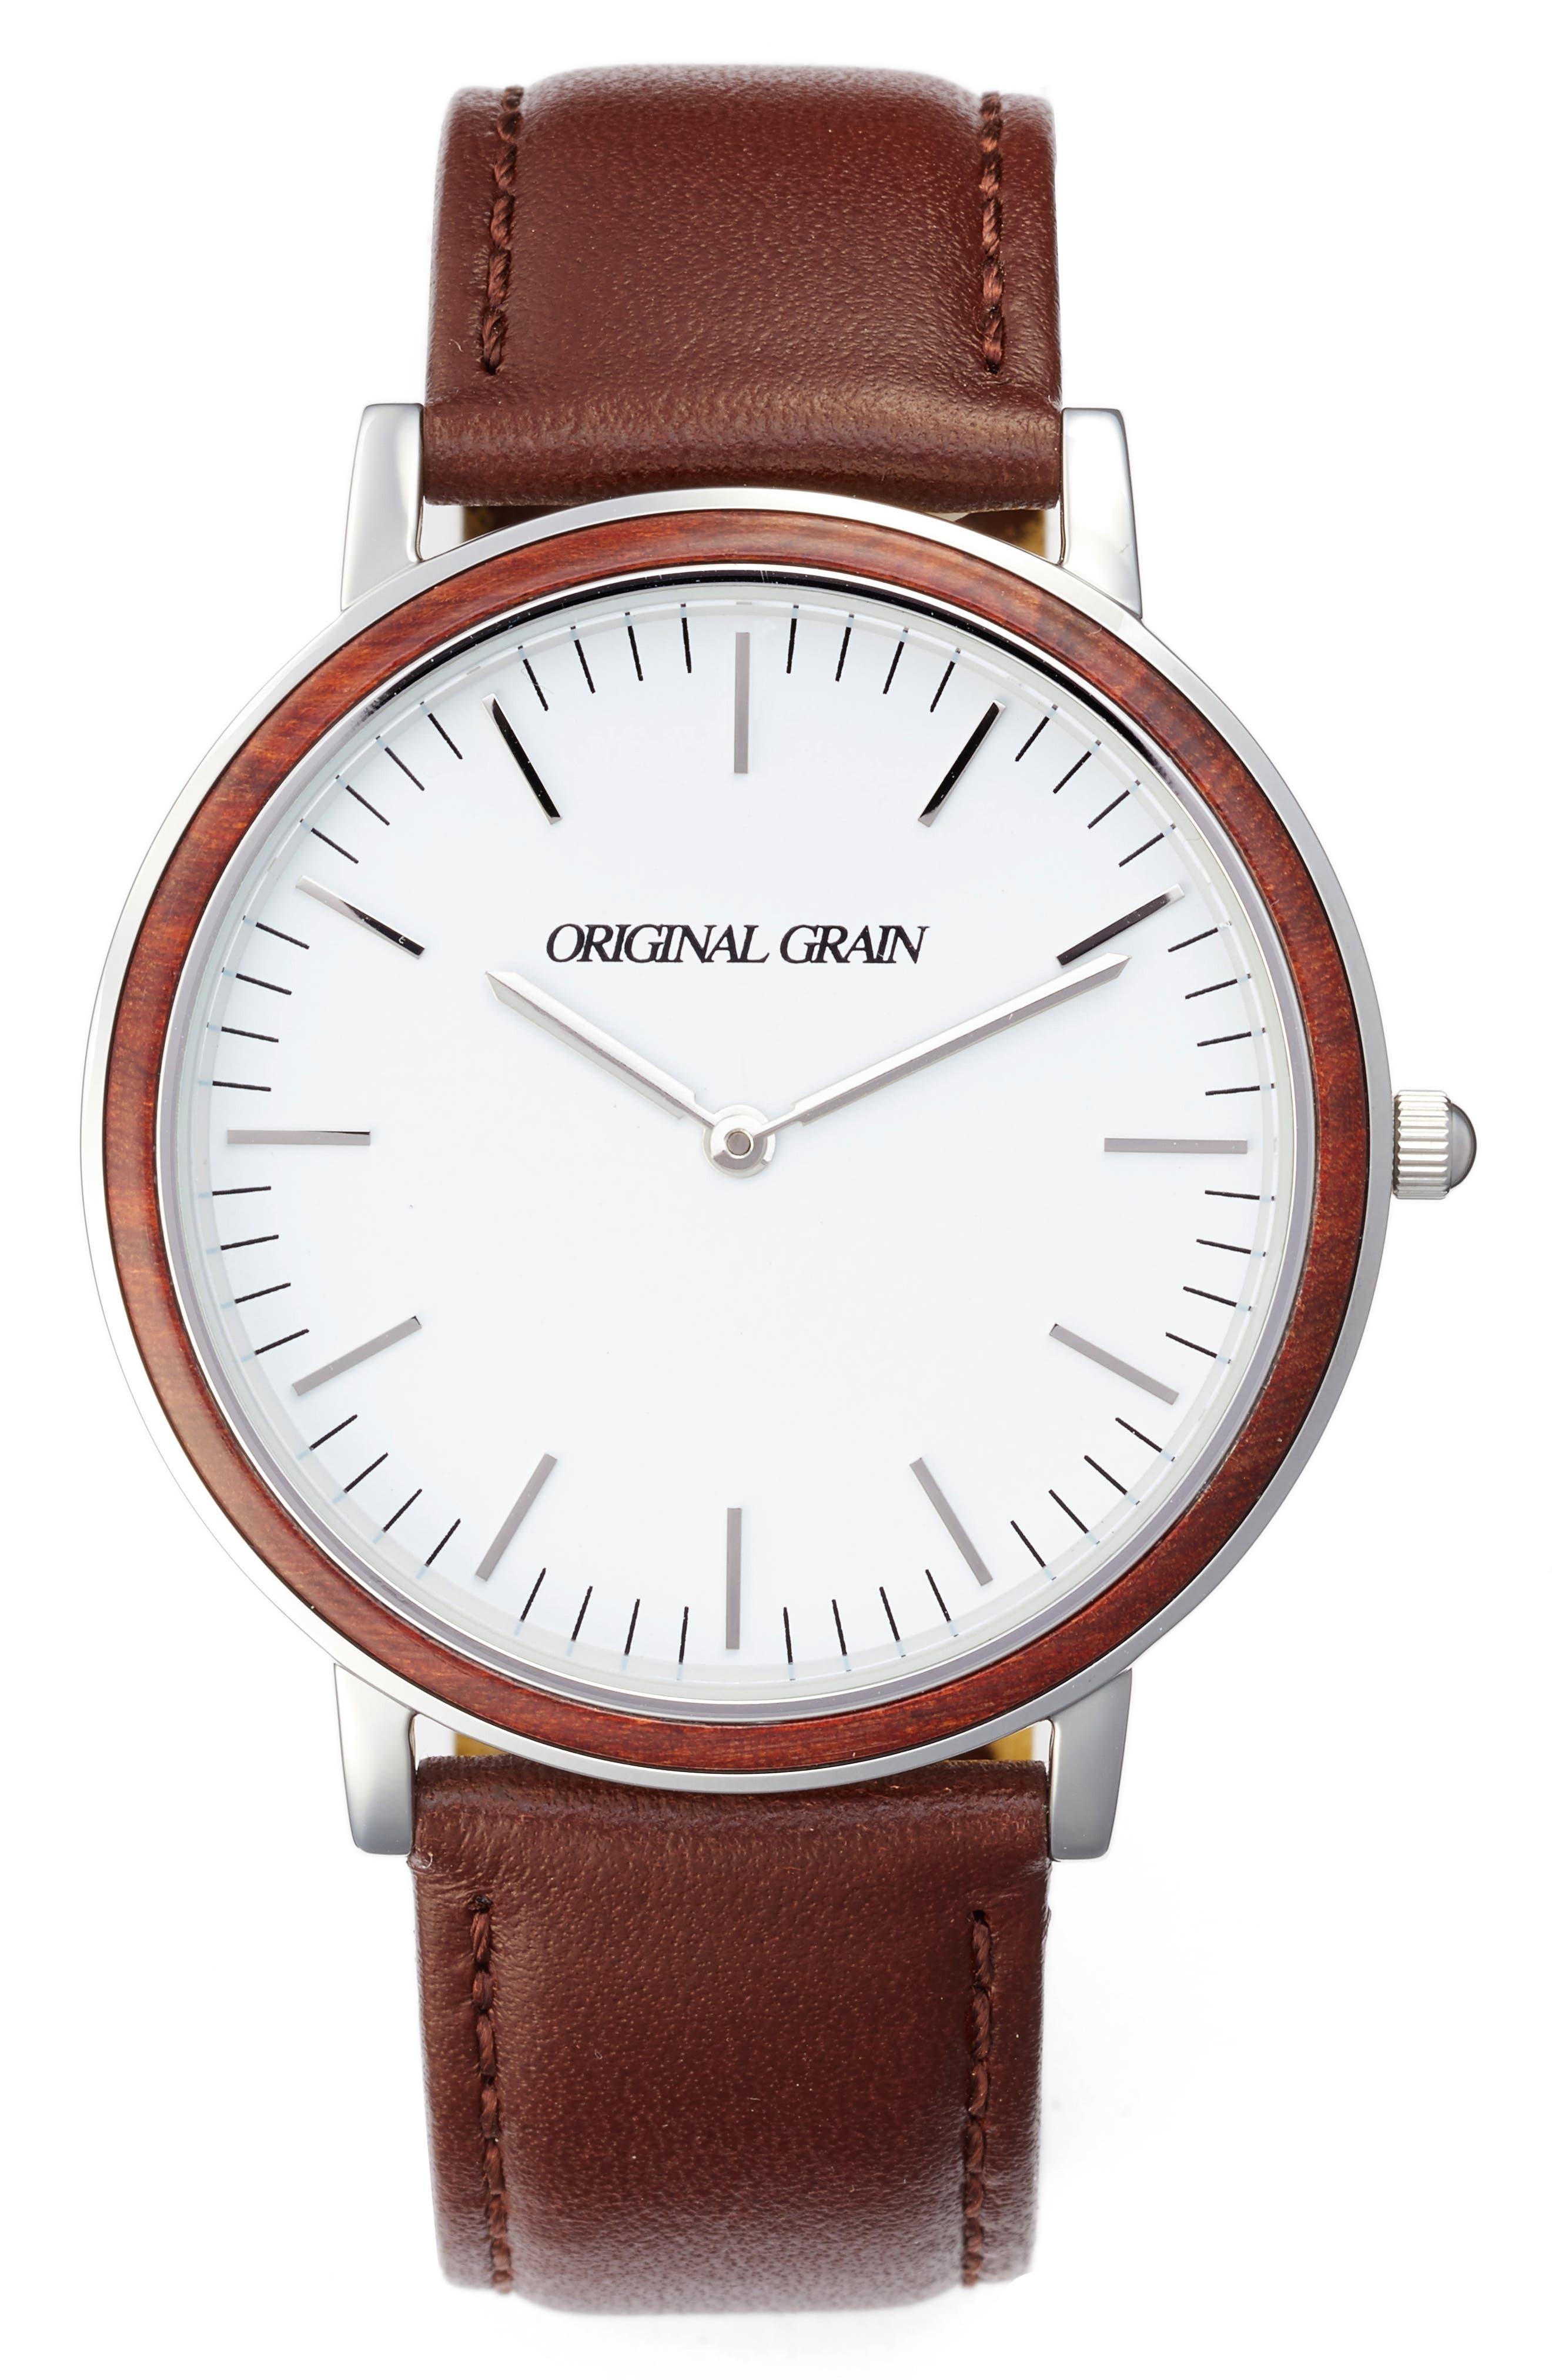 Main Image - Original Grain Minimalist Leather Strap Watch, 40mm